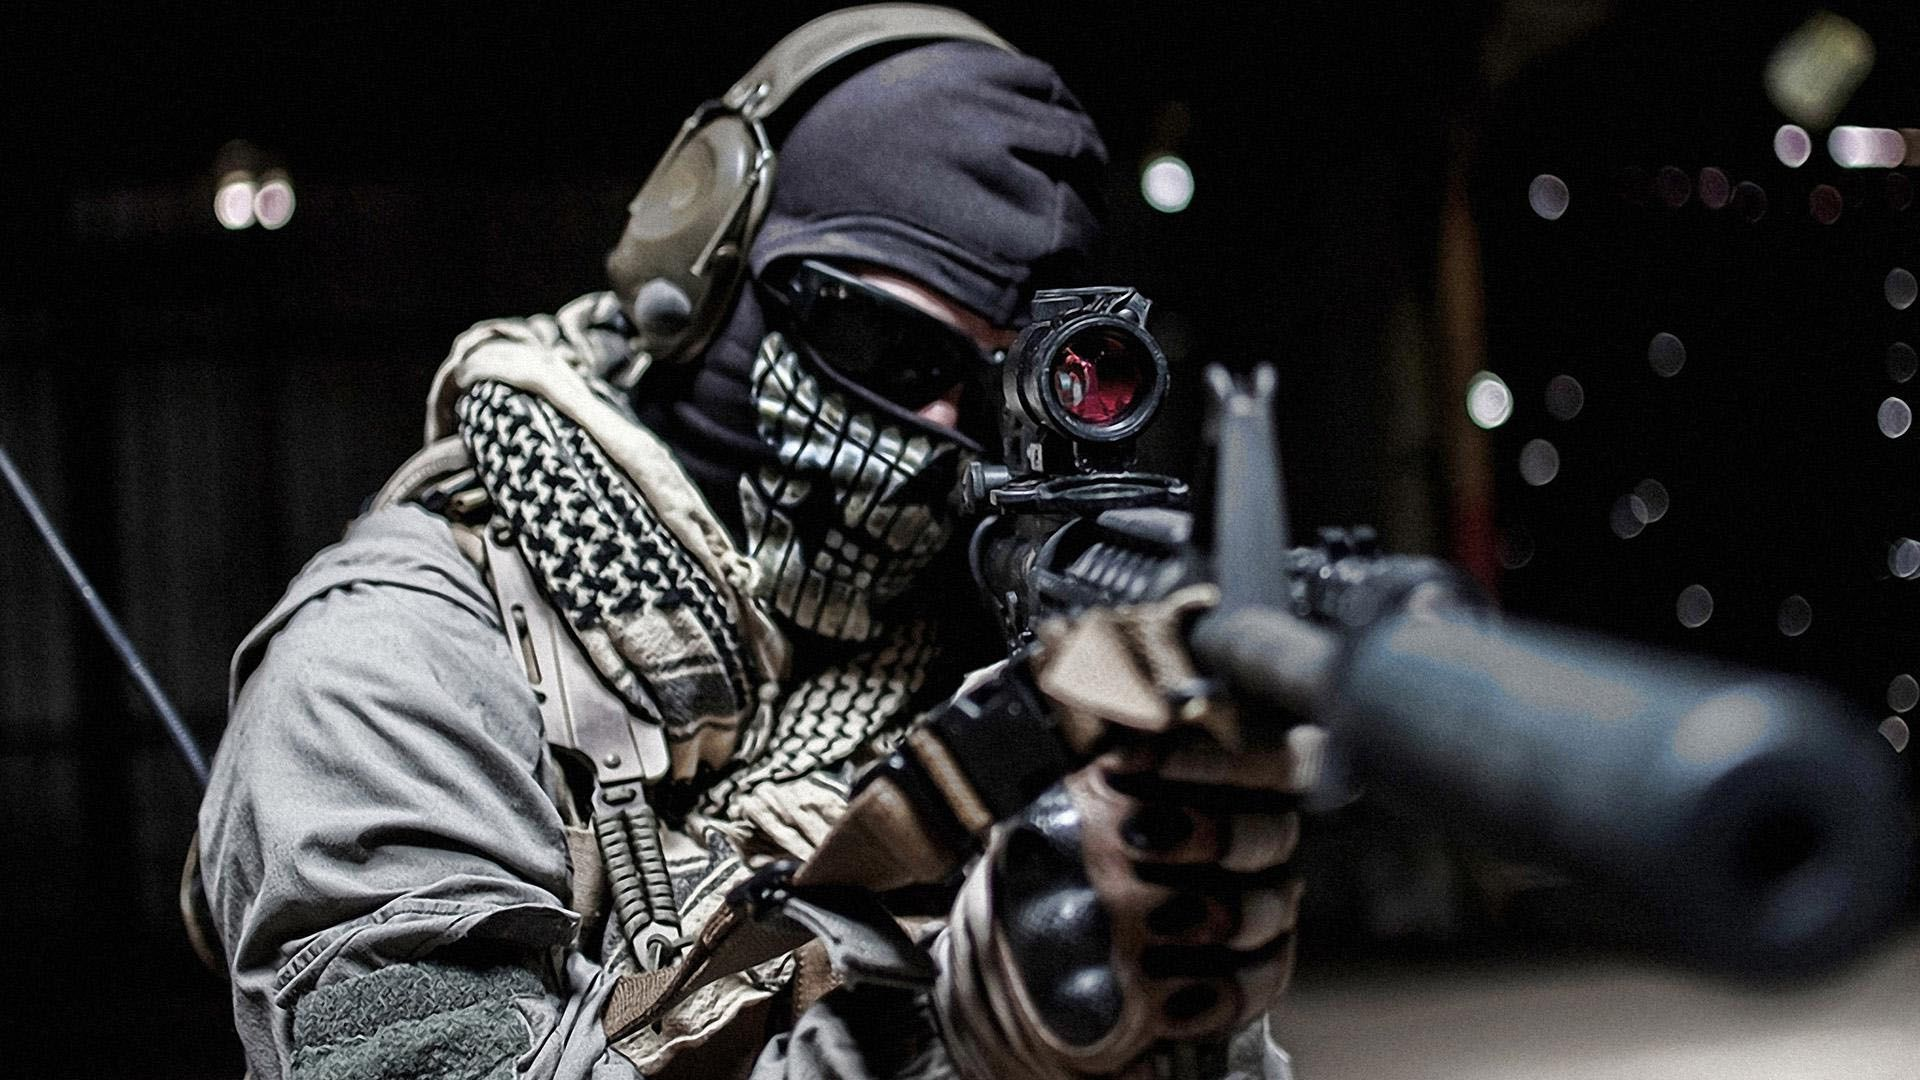 Cod Sniper Wallpaper WallpaperSafari Military Photos Pinterest